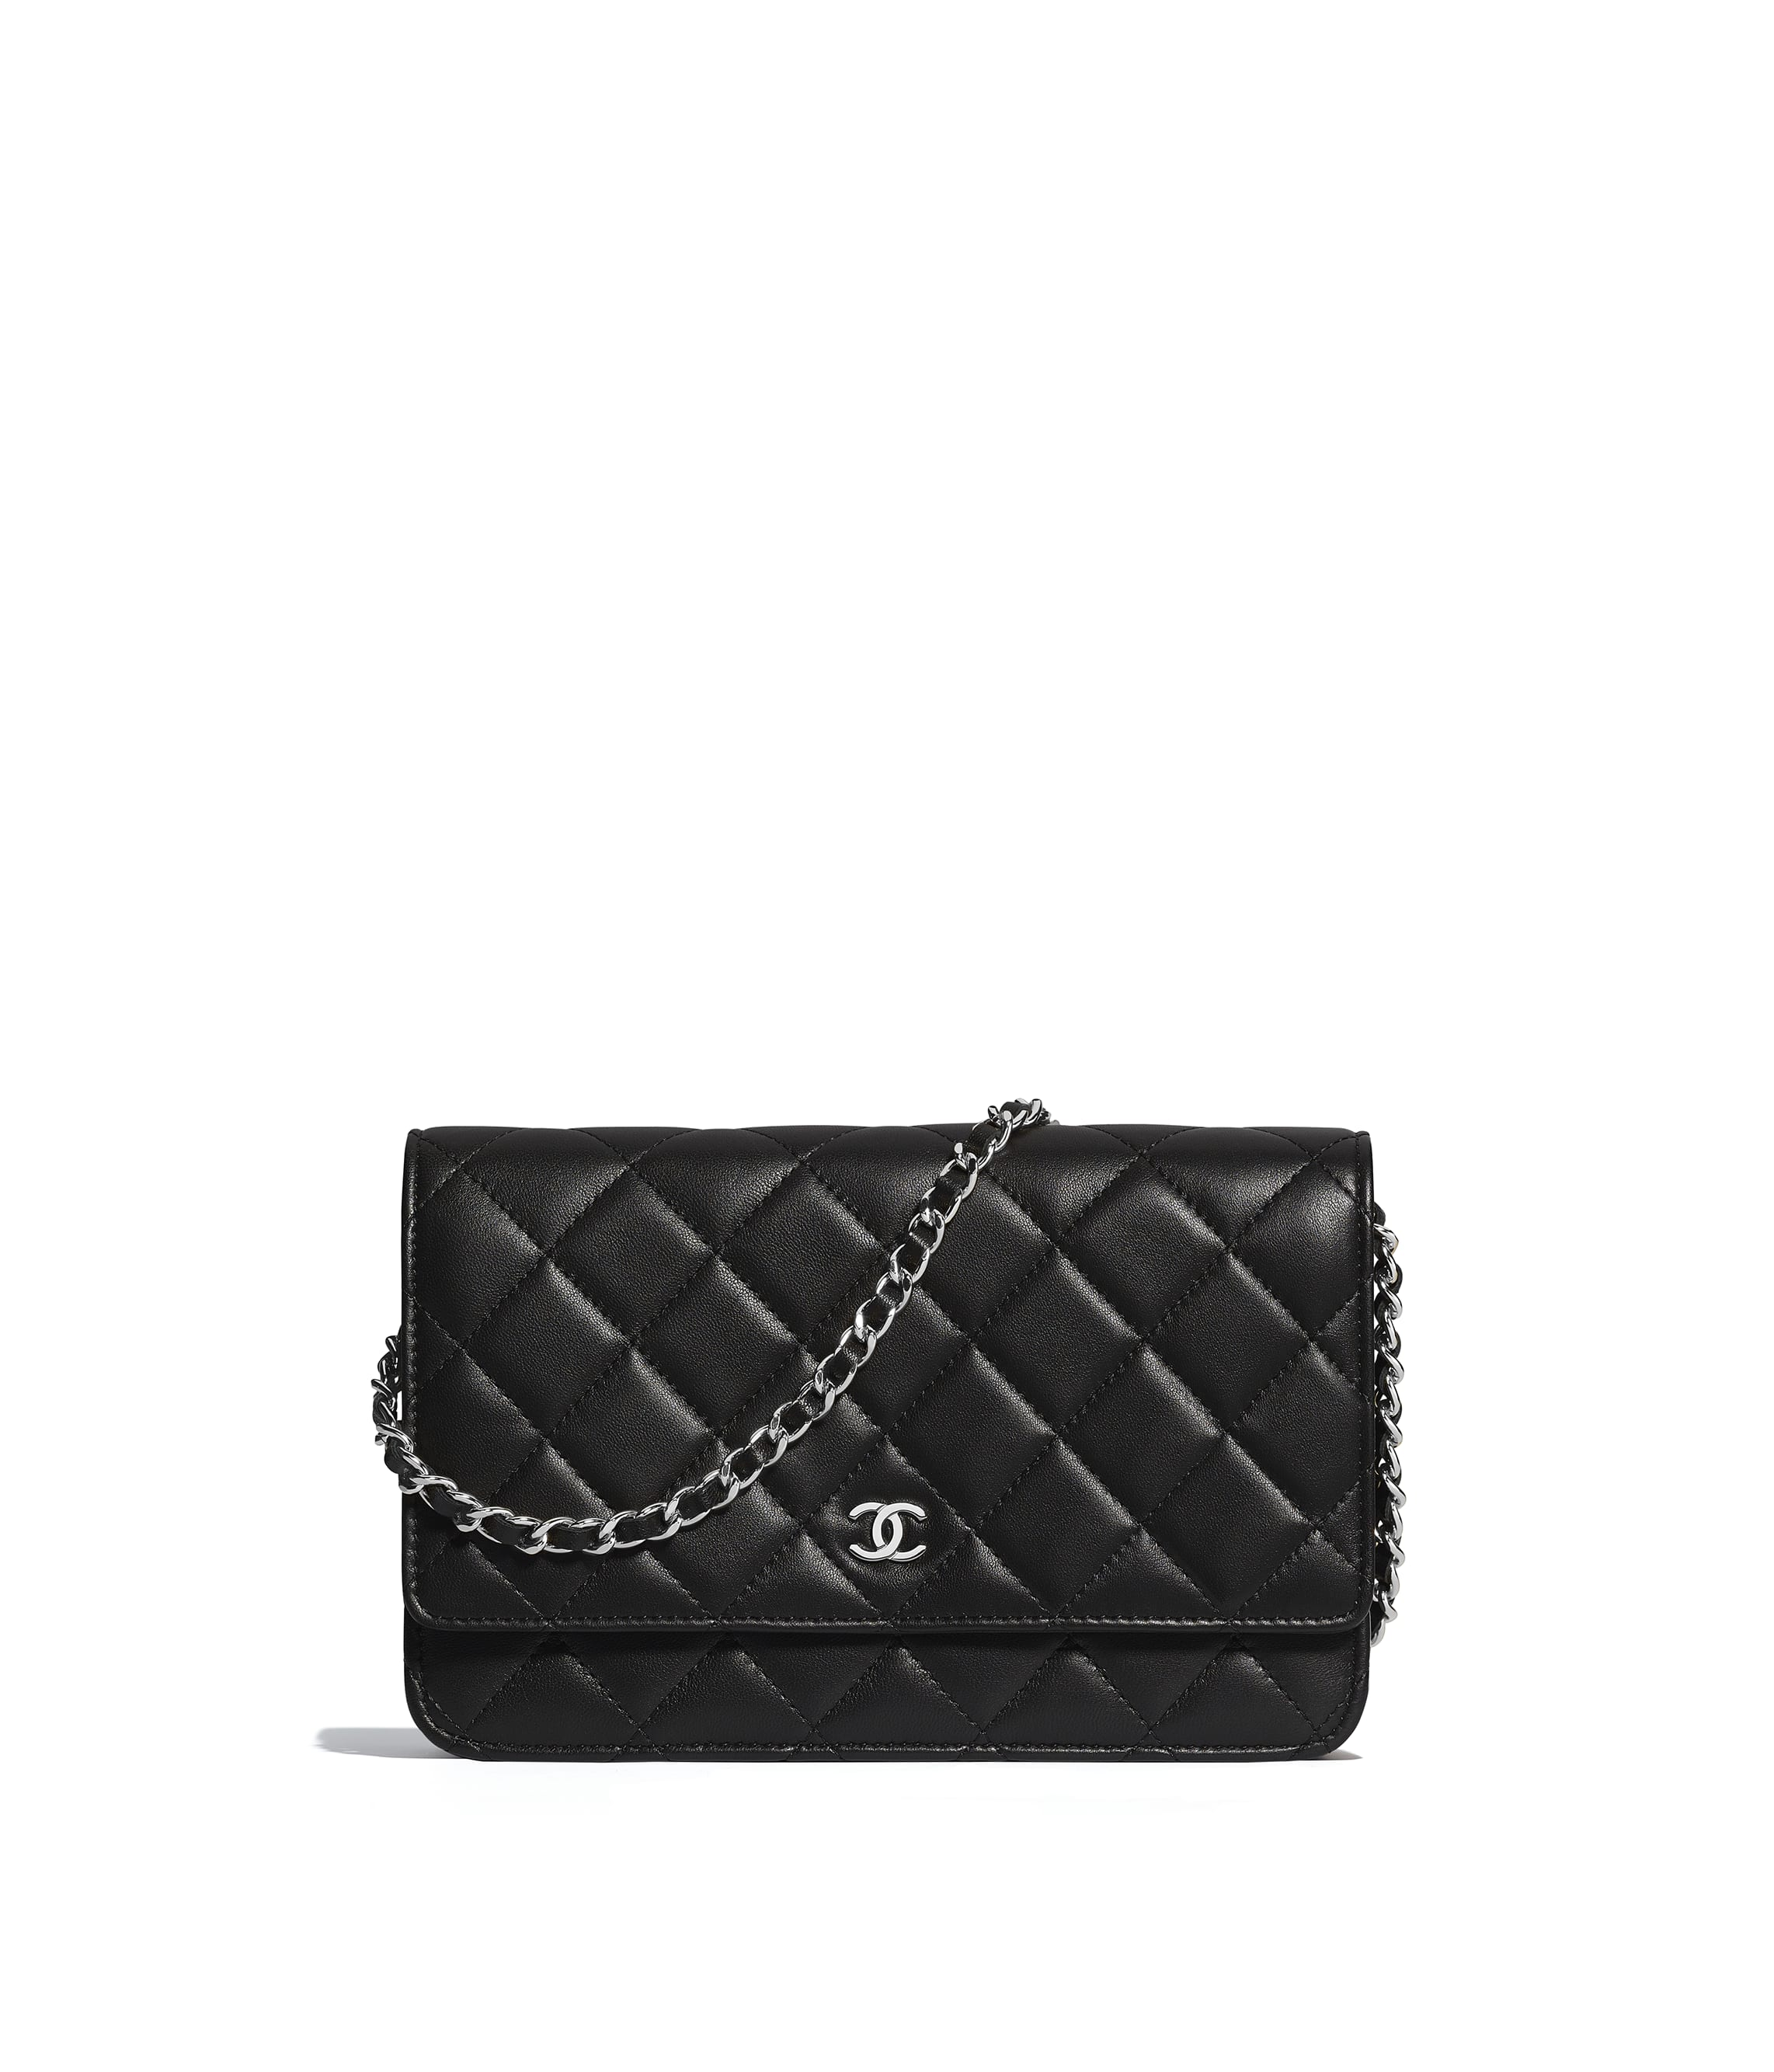 58f4d278b1 Classic Wallet On Chain, lambskin, black - CHANEL